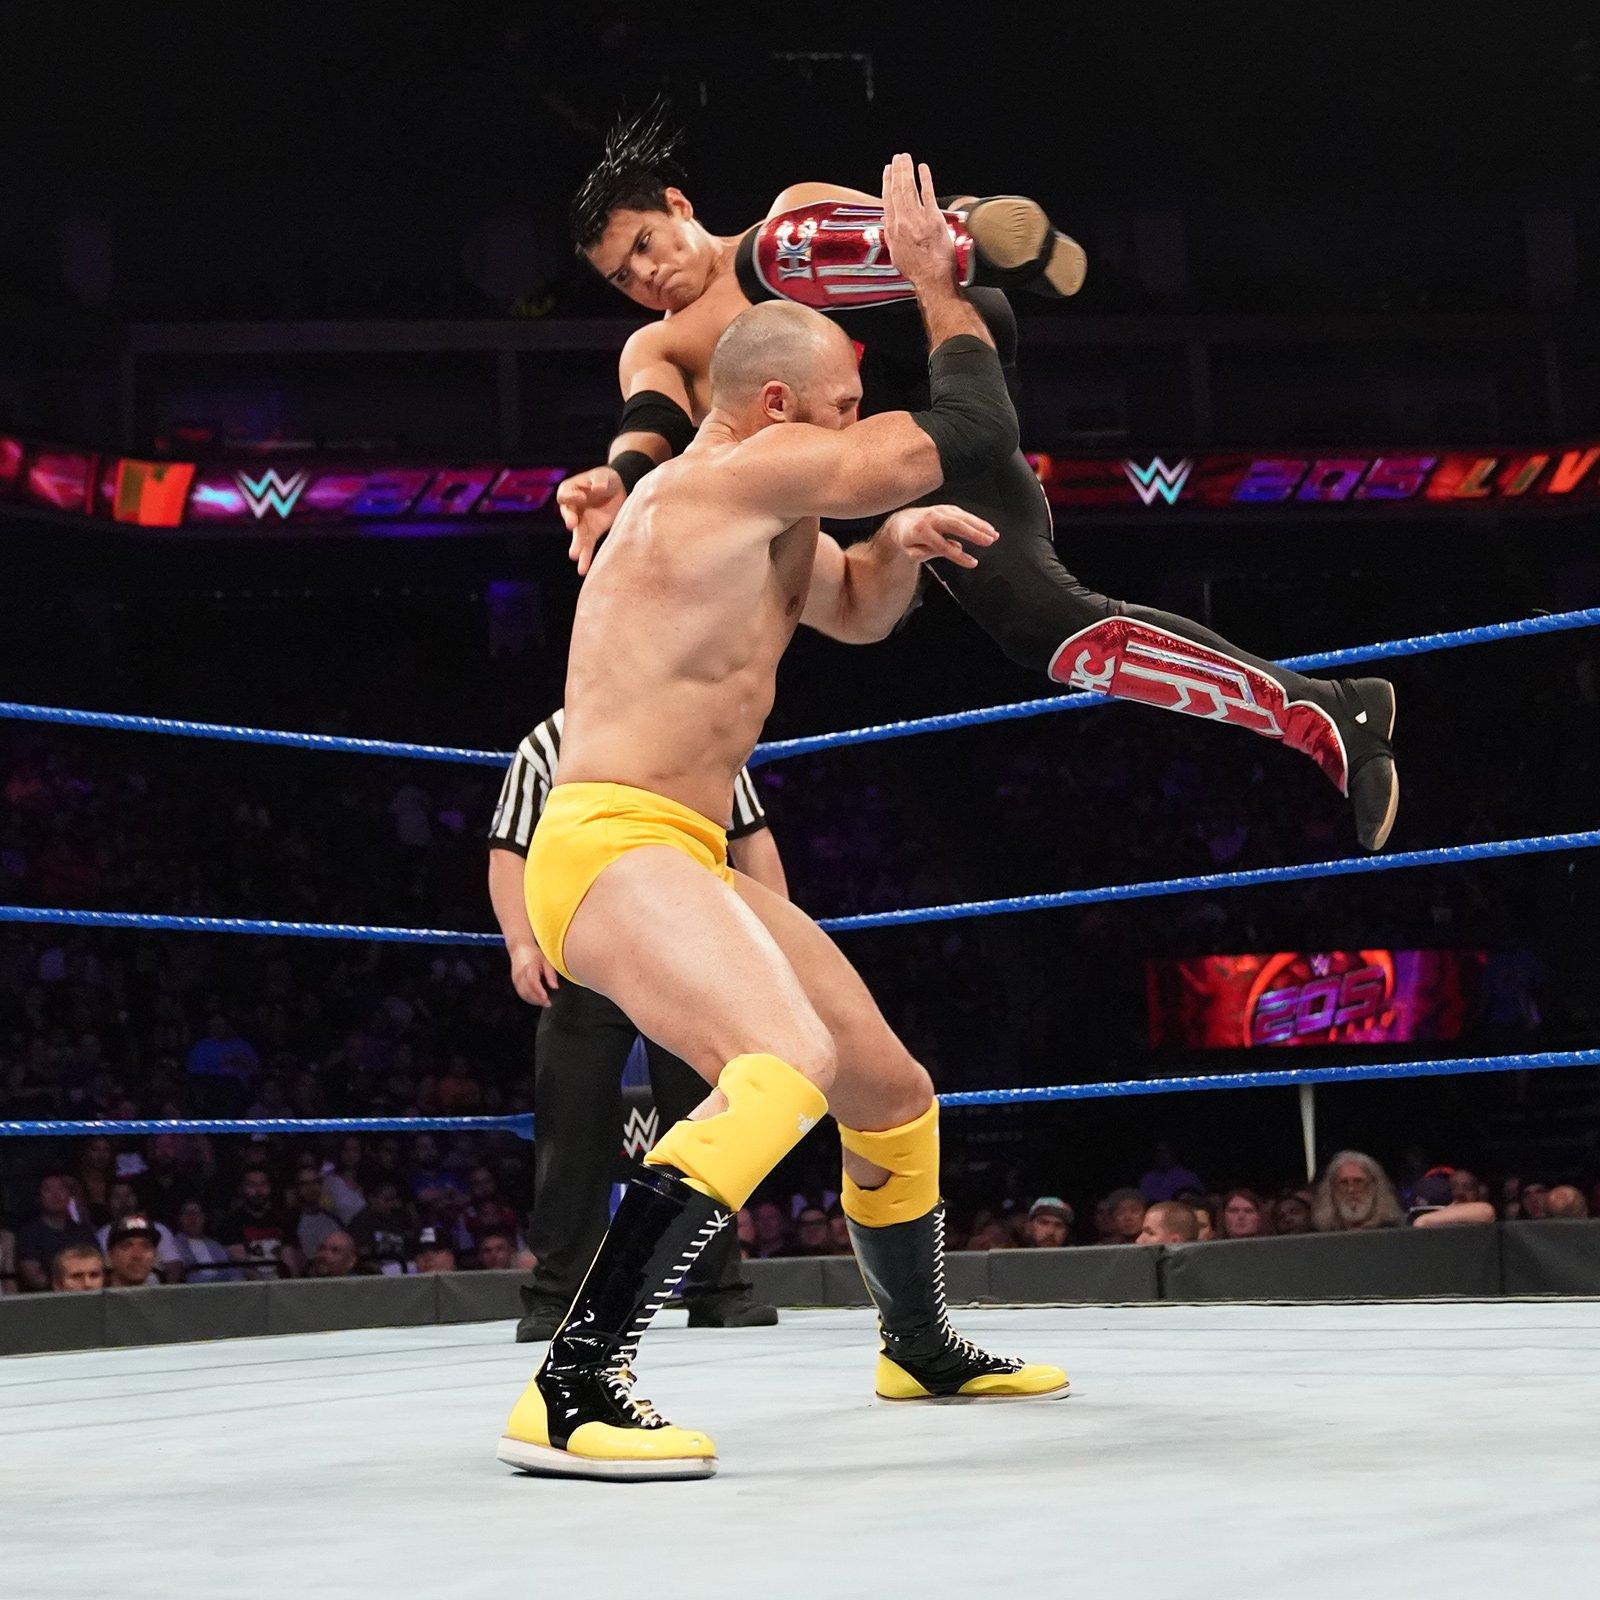 Akira Tozawa vs. Humbero Carrillo vs. Oney Lorcan vs. Drew Gulak